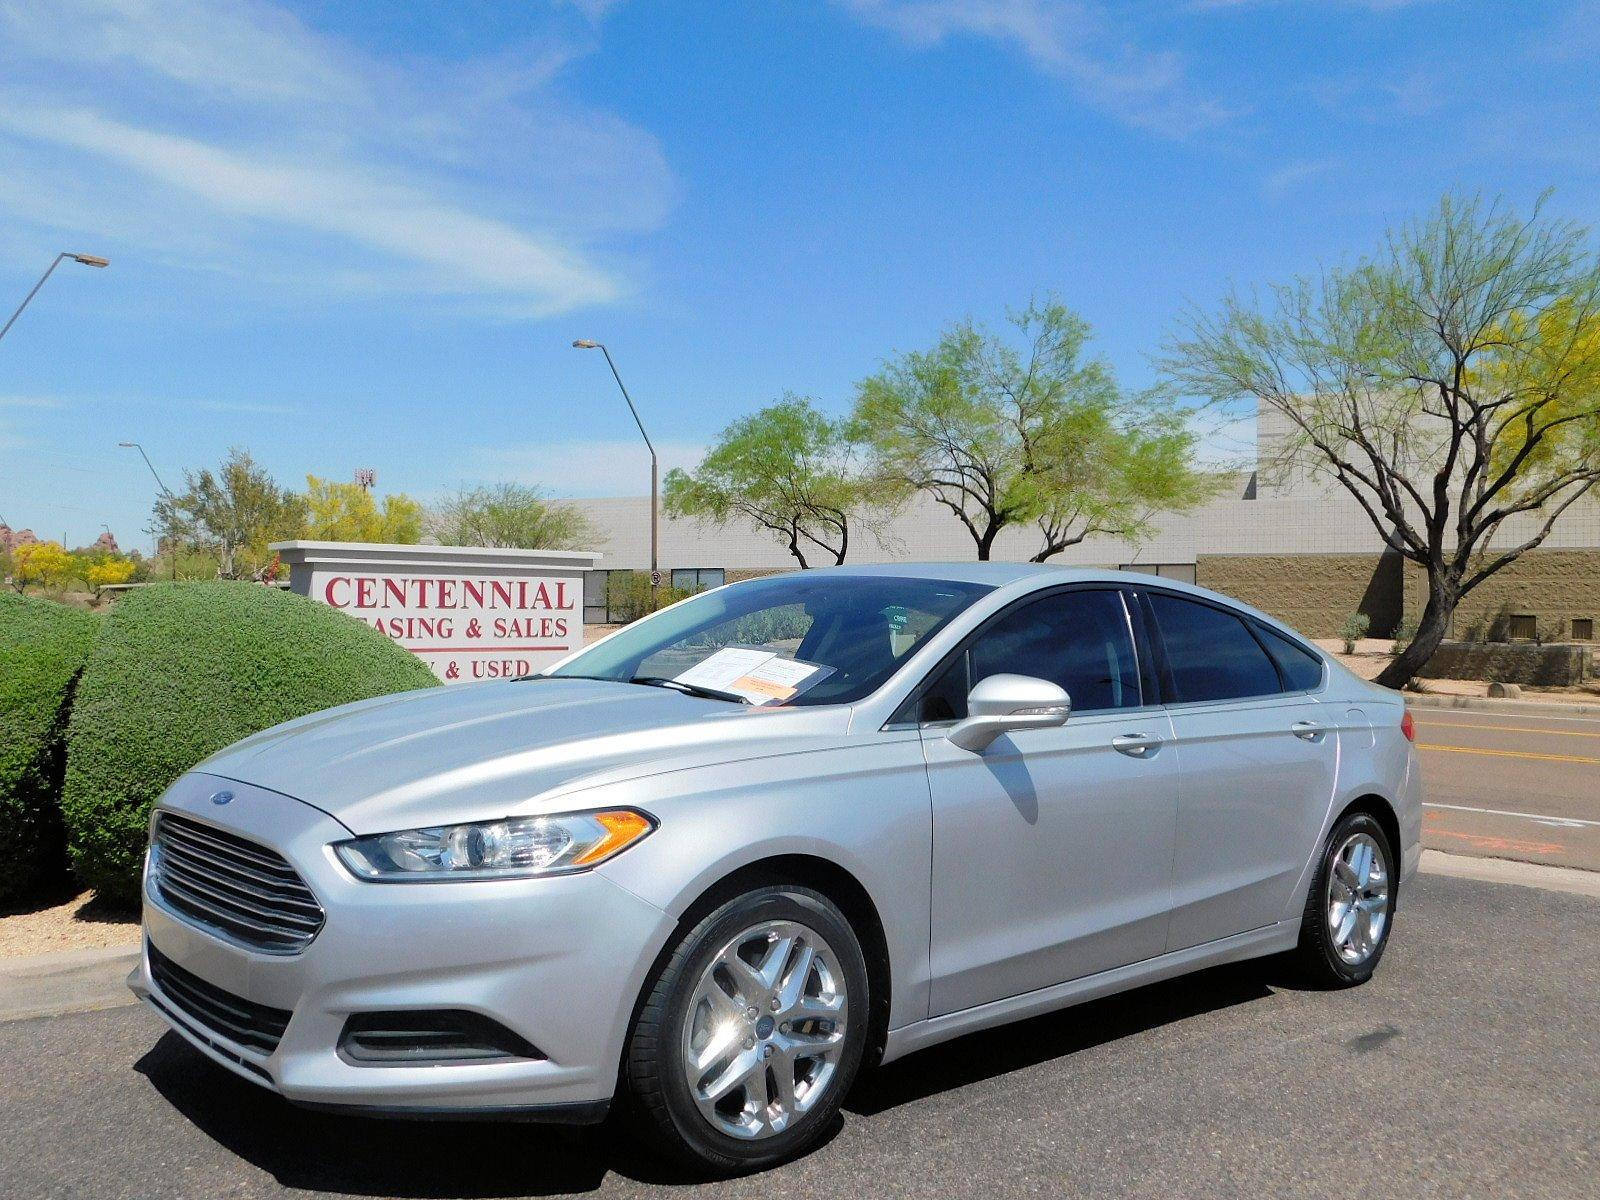 Phoenix Used Cars: All New & Used Car Listings for Arizona.